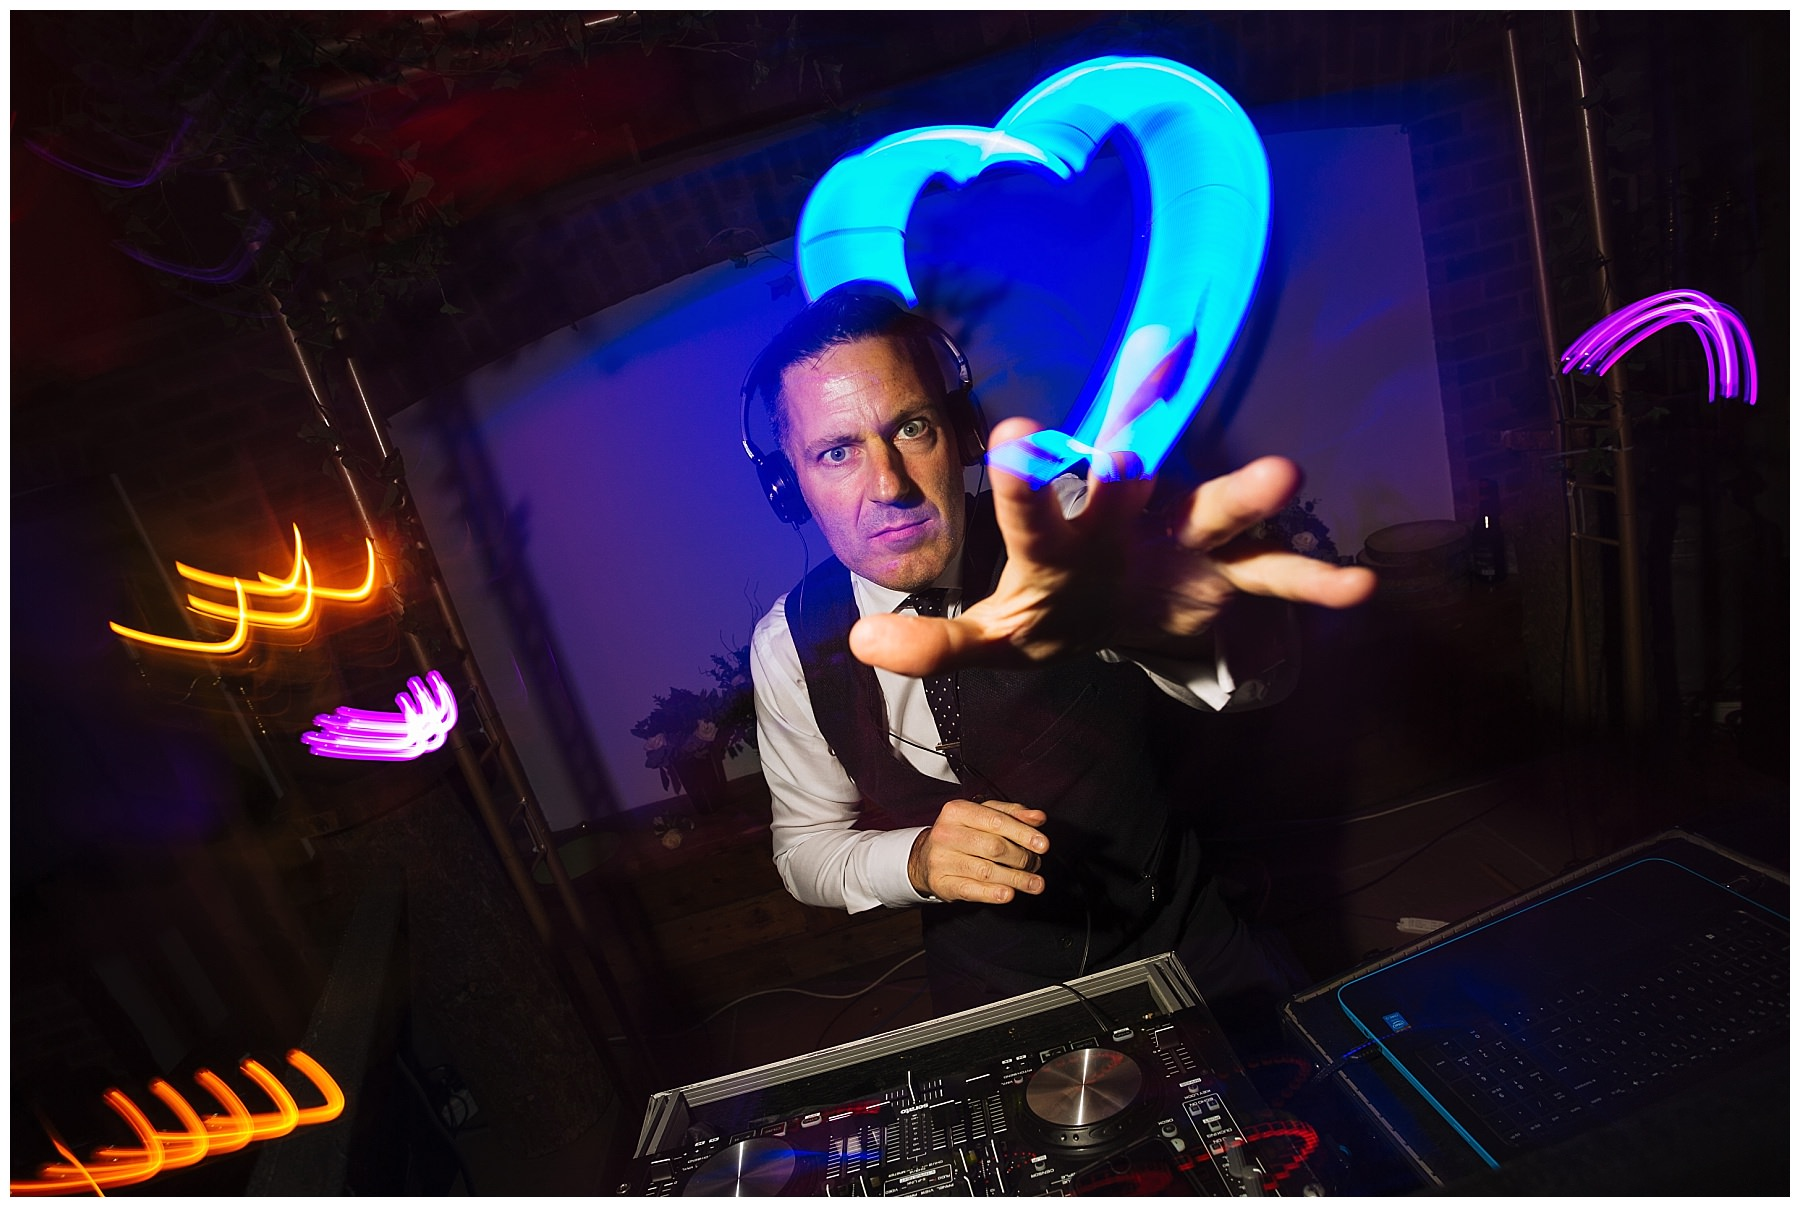 DJ Andy Murphy